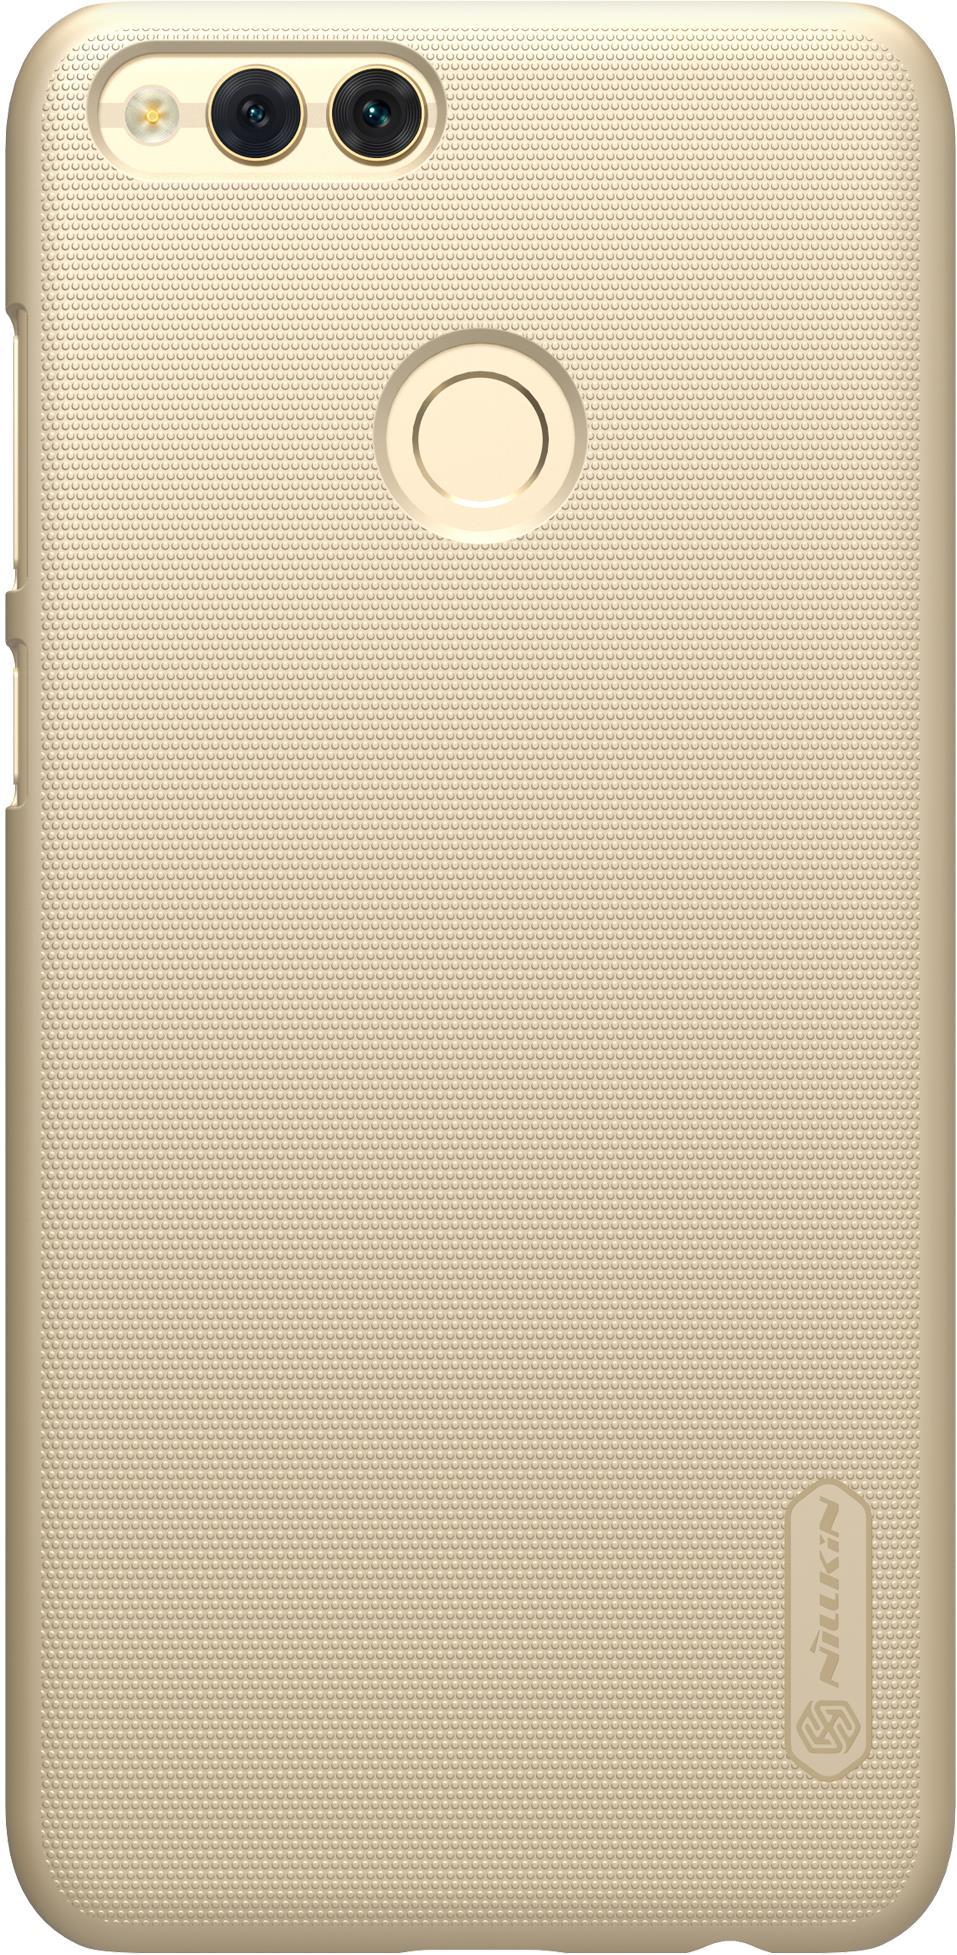 Чехол для сотового телефона Nillkin T-N-HH7X-002, золотой накладка nillkin super frosted shield для iphone 6 plus цвет белый t n iphone6p 002